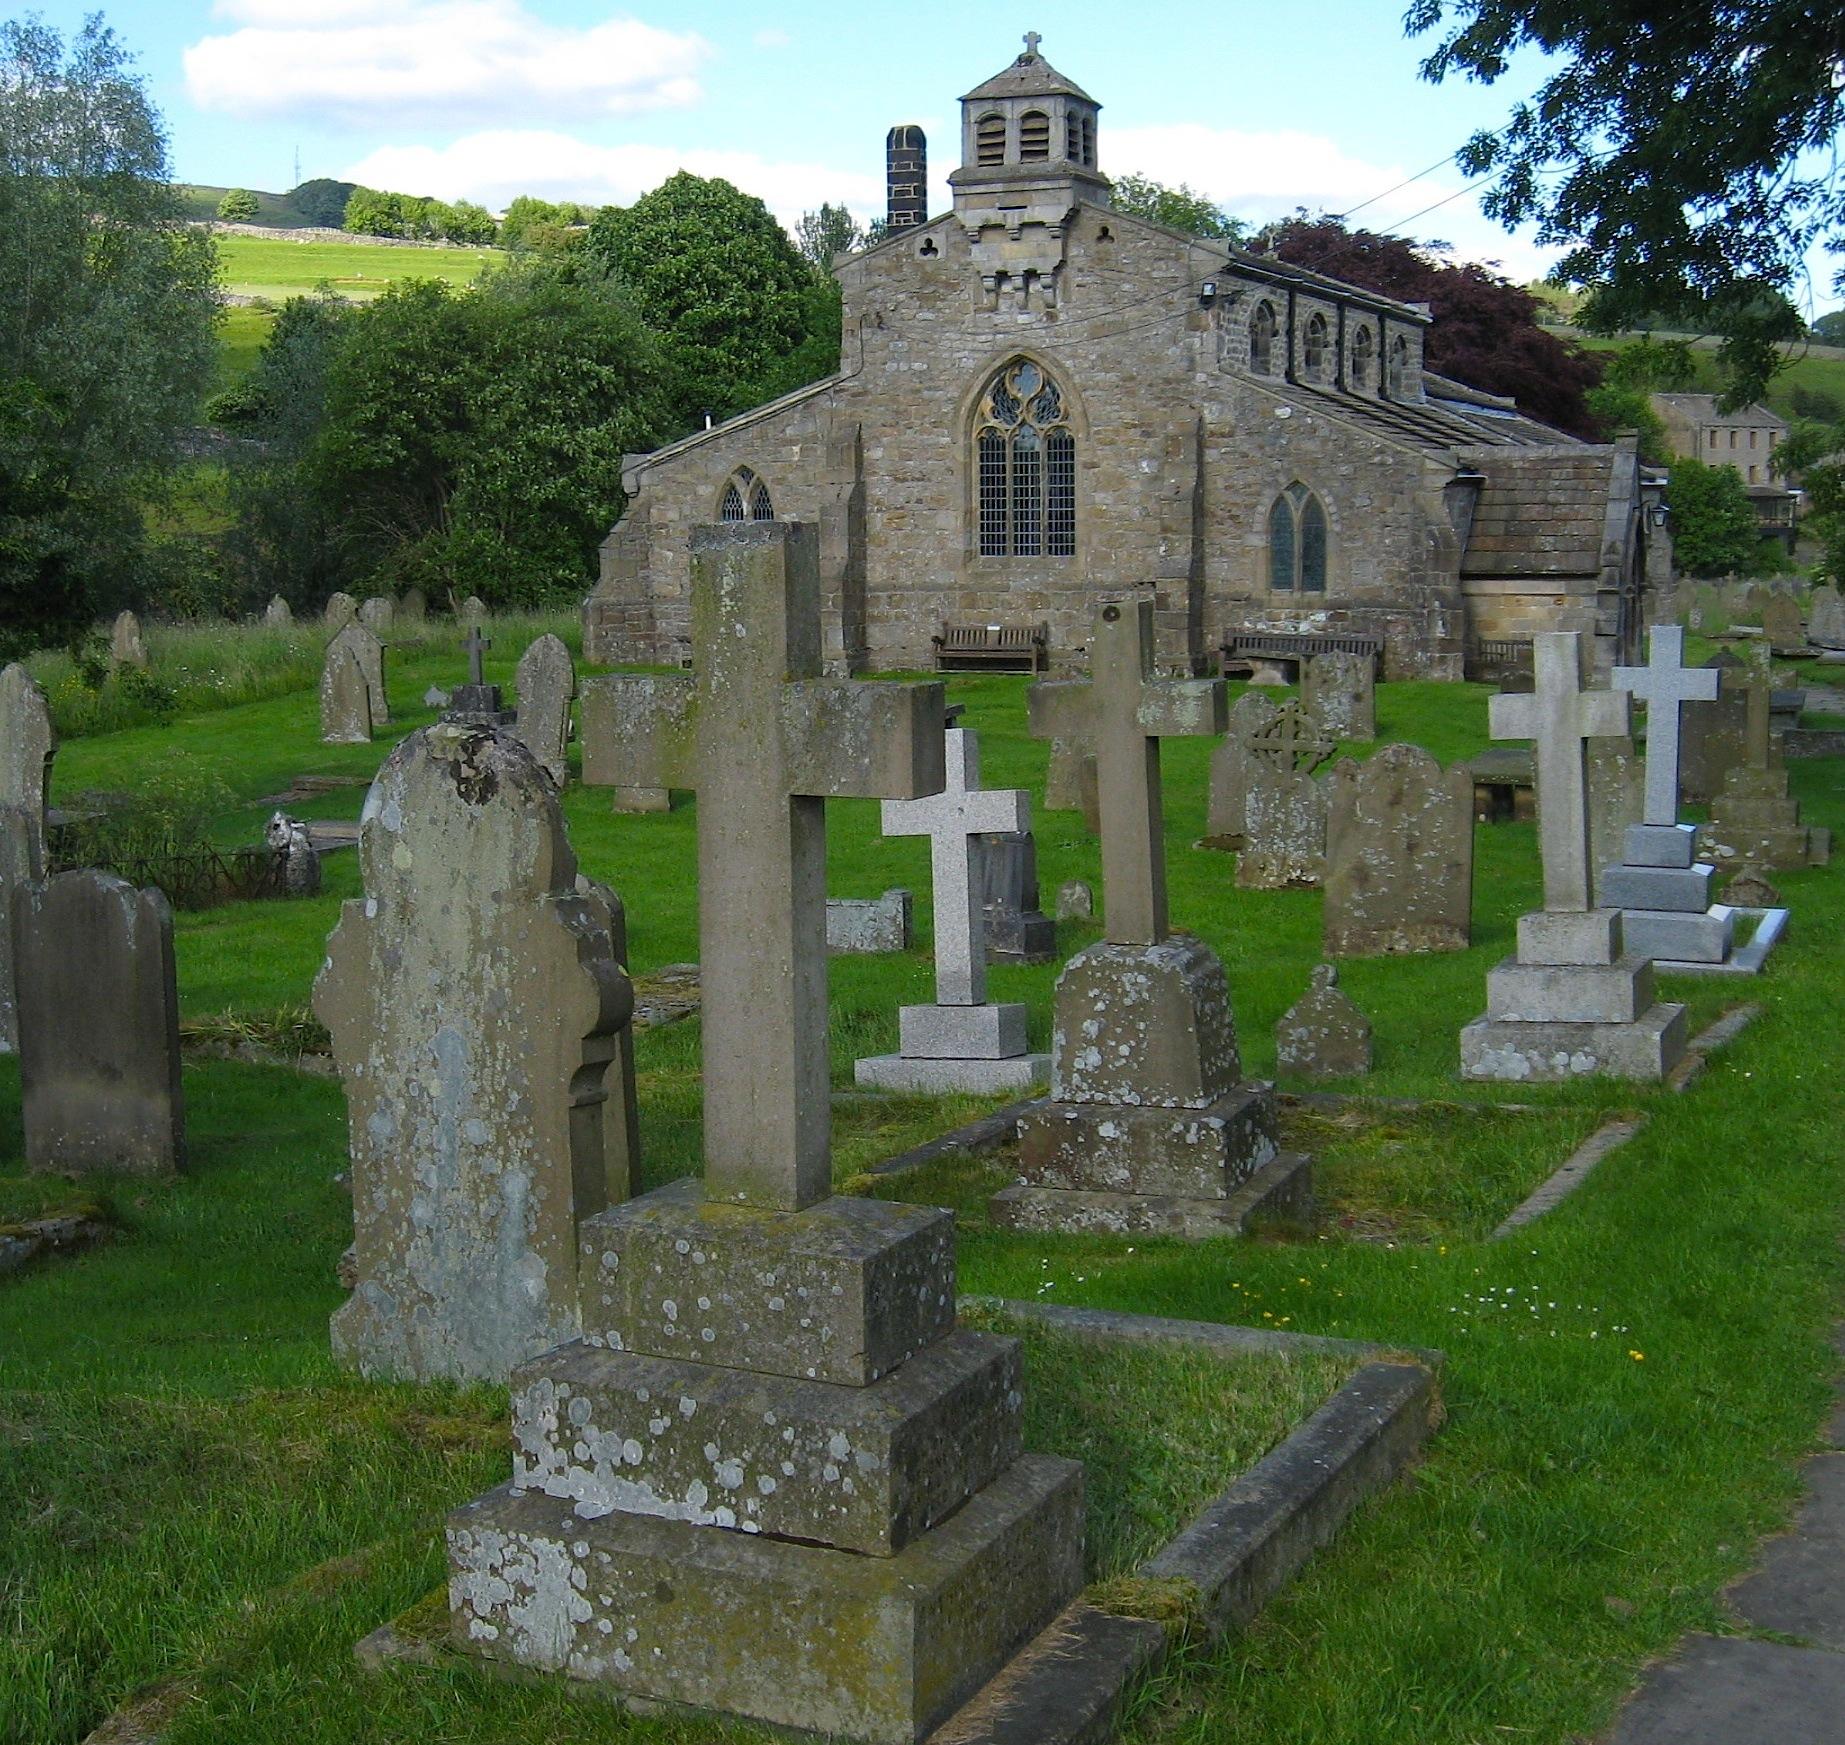 File:Linton churchyard, broad view.jpg - Wikimedia Commons